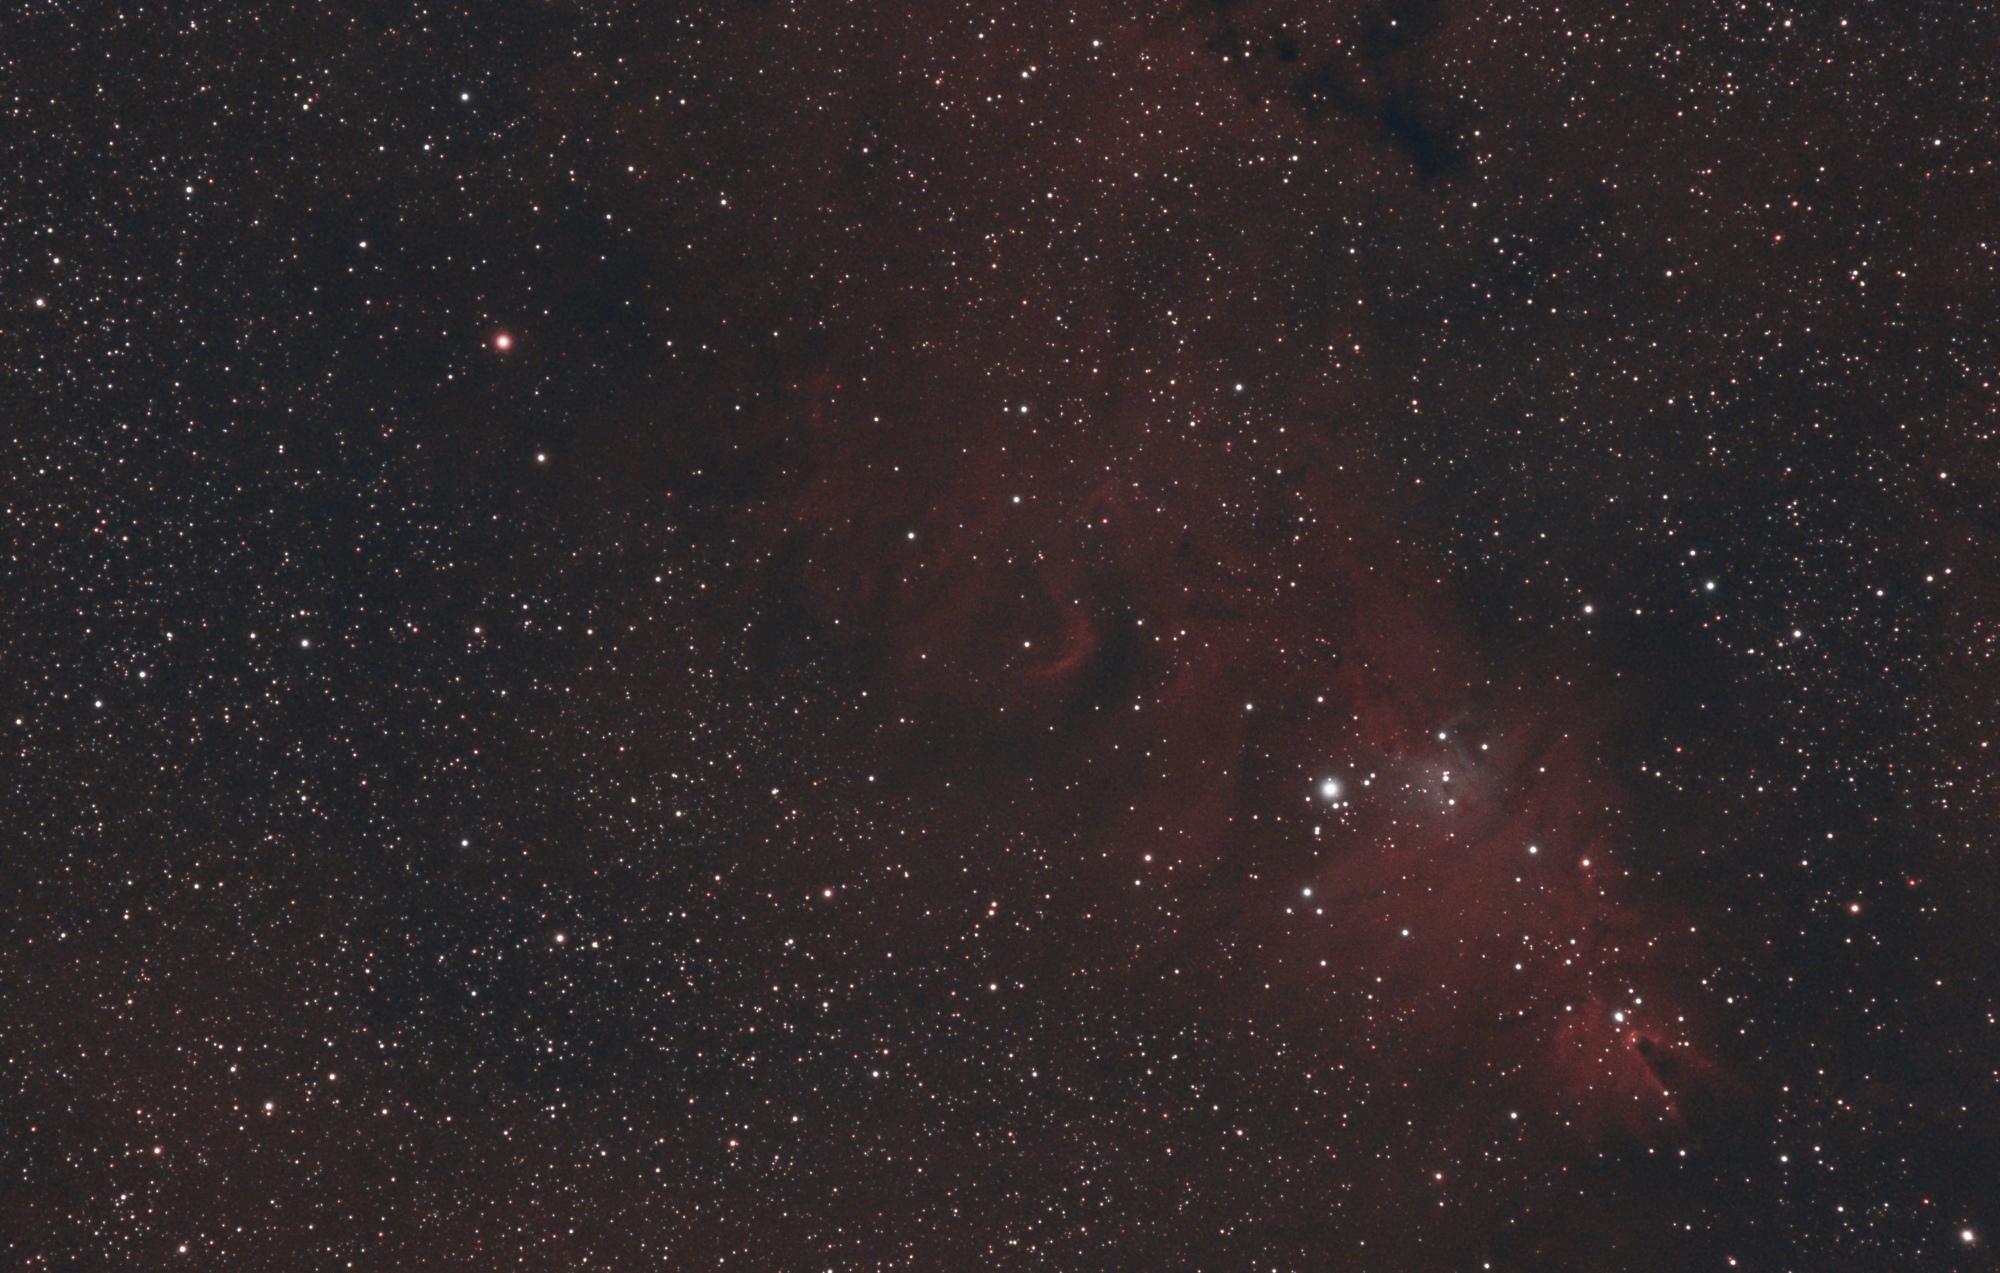 NGC_2264_20-02-2021.thumb.jpg.d9bf3ef45c9e6d7572983586bf8d7f87.jpg